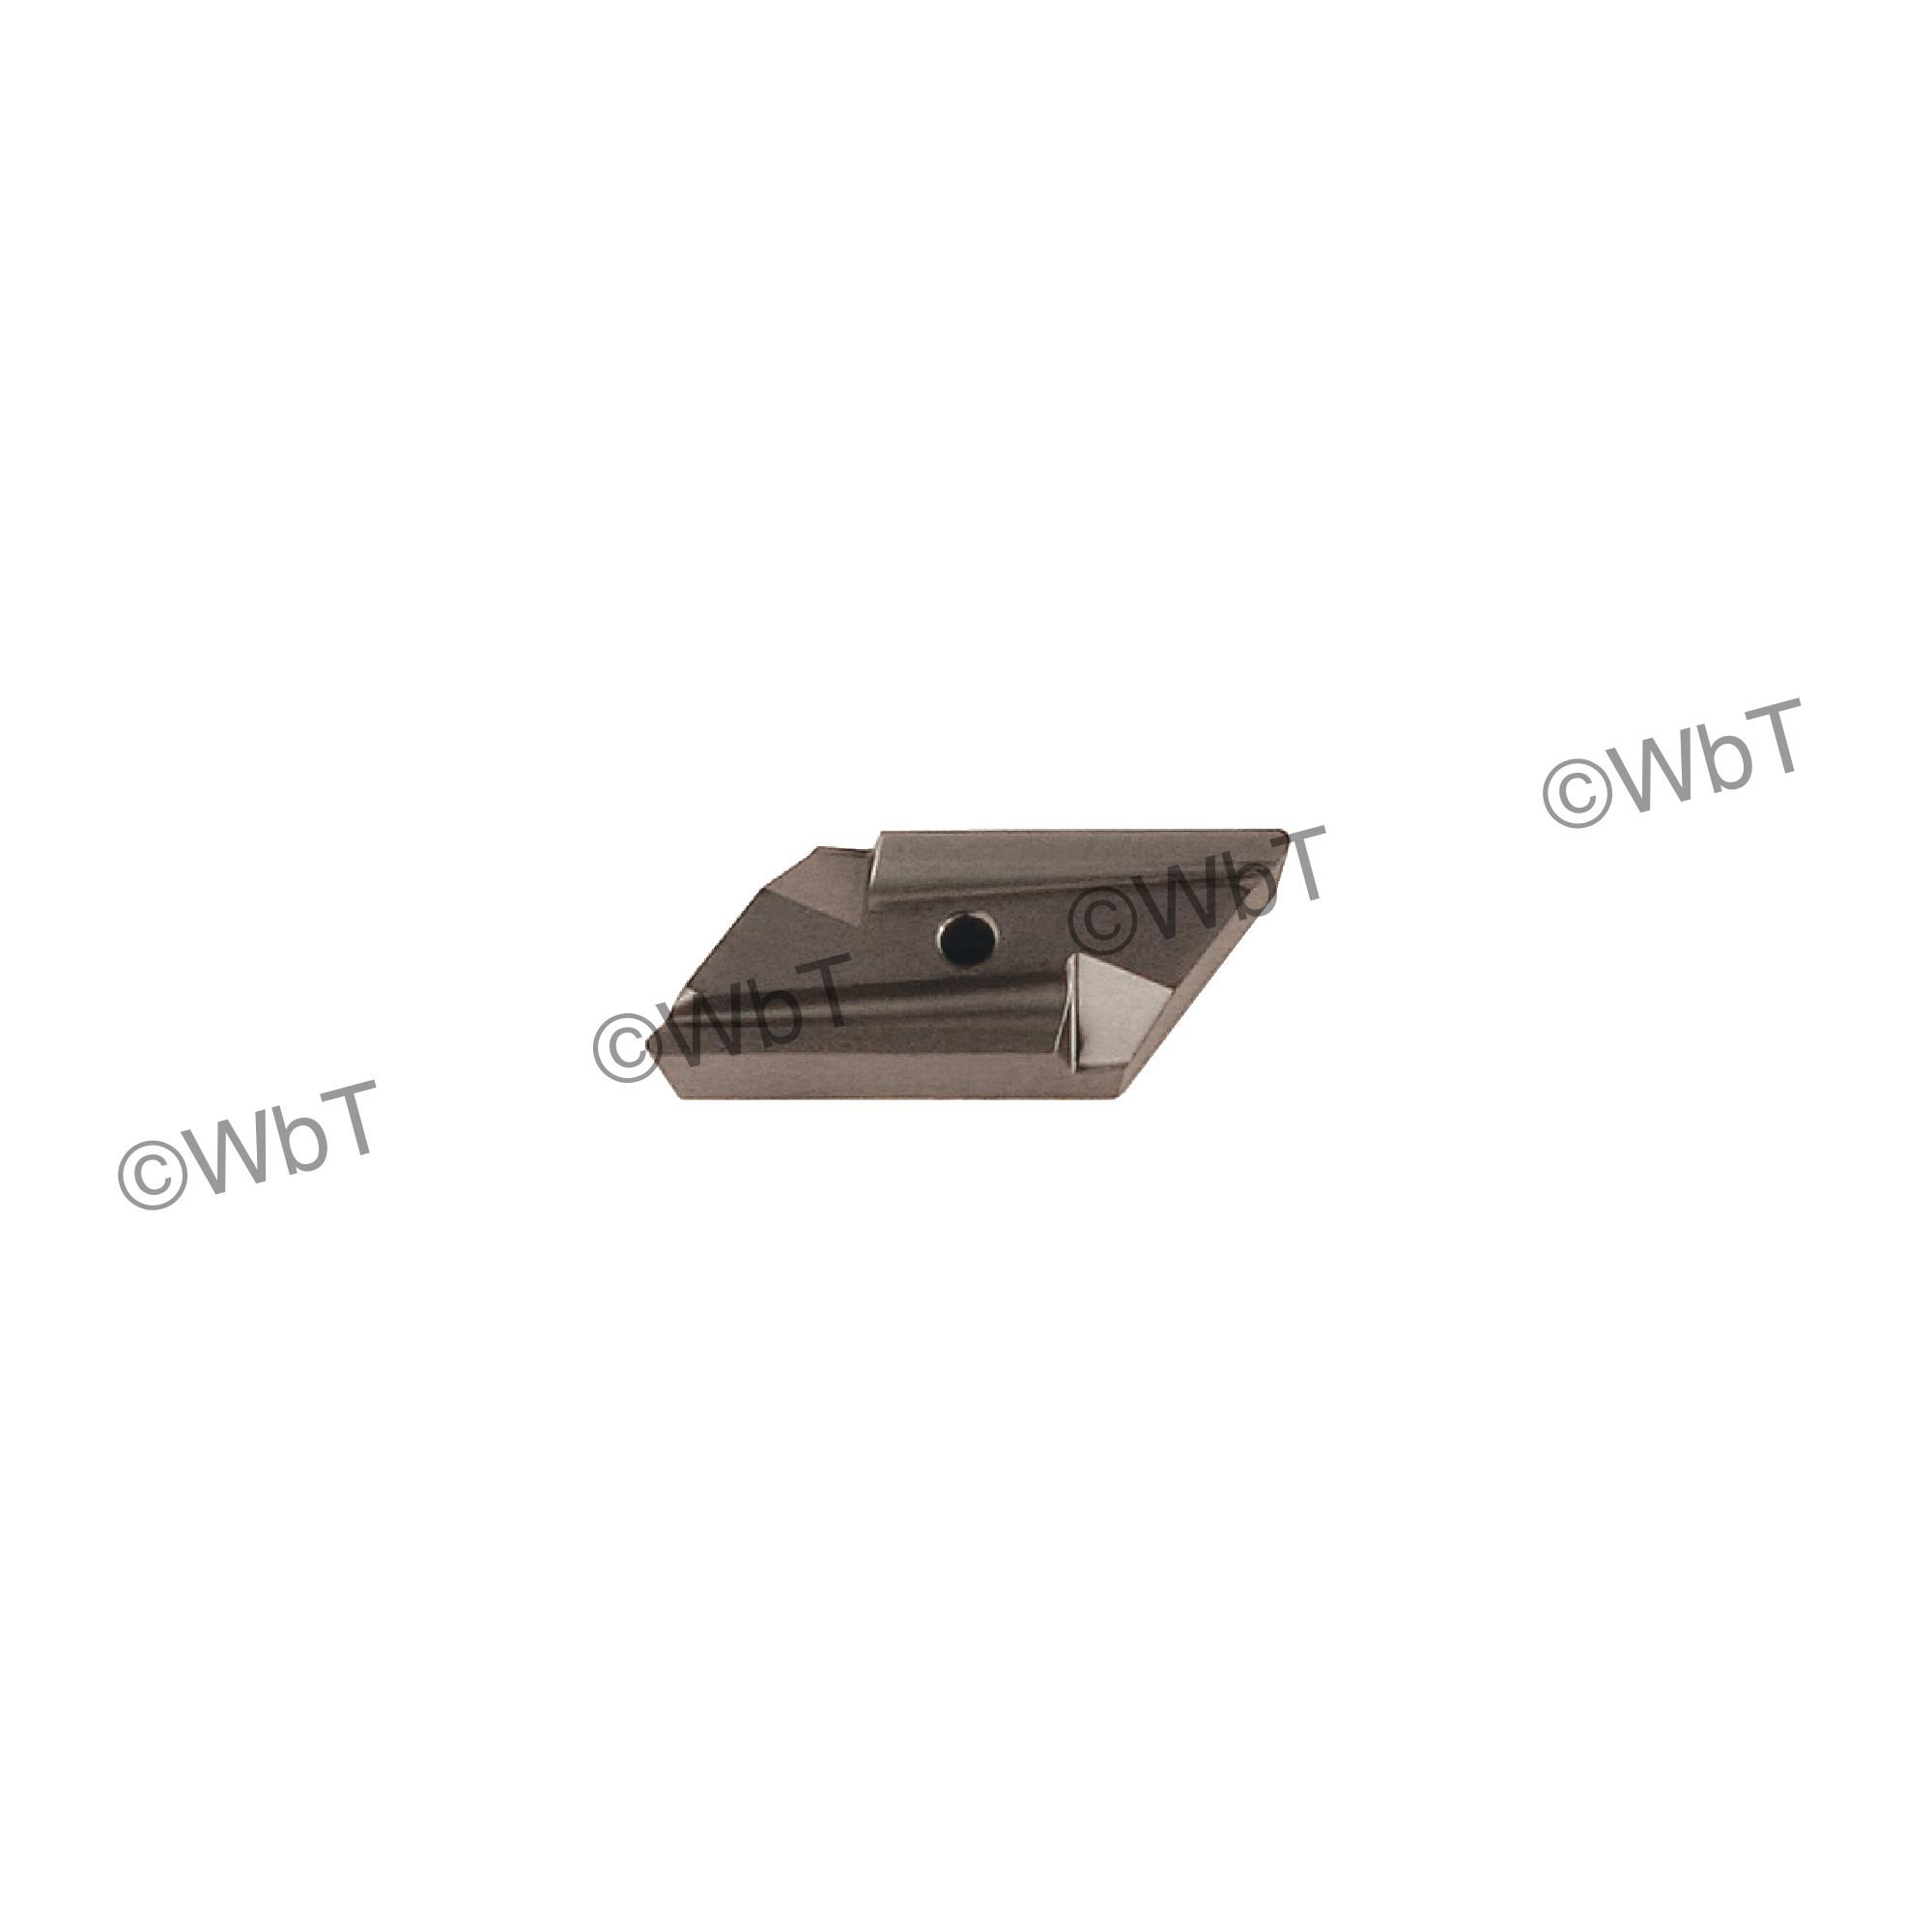 LAMINA - KNUX160405R-11 LT10 - 55° PARALLELOGRAM / Indexable Carbide Turning Insert